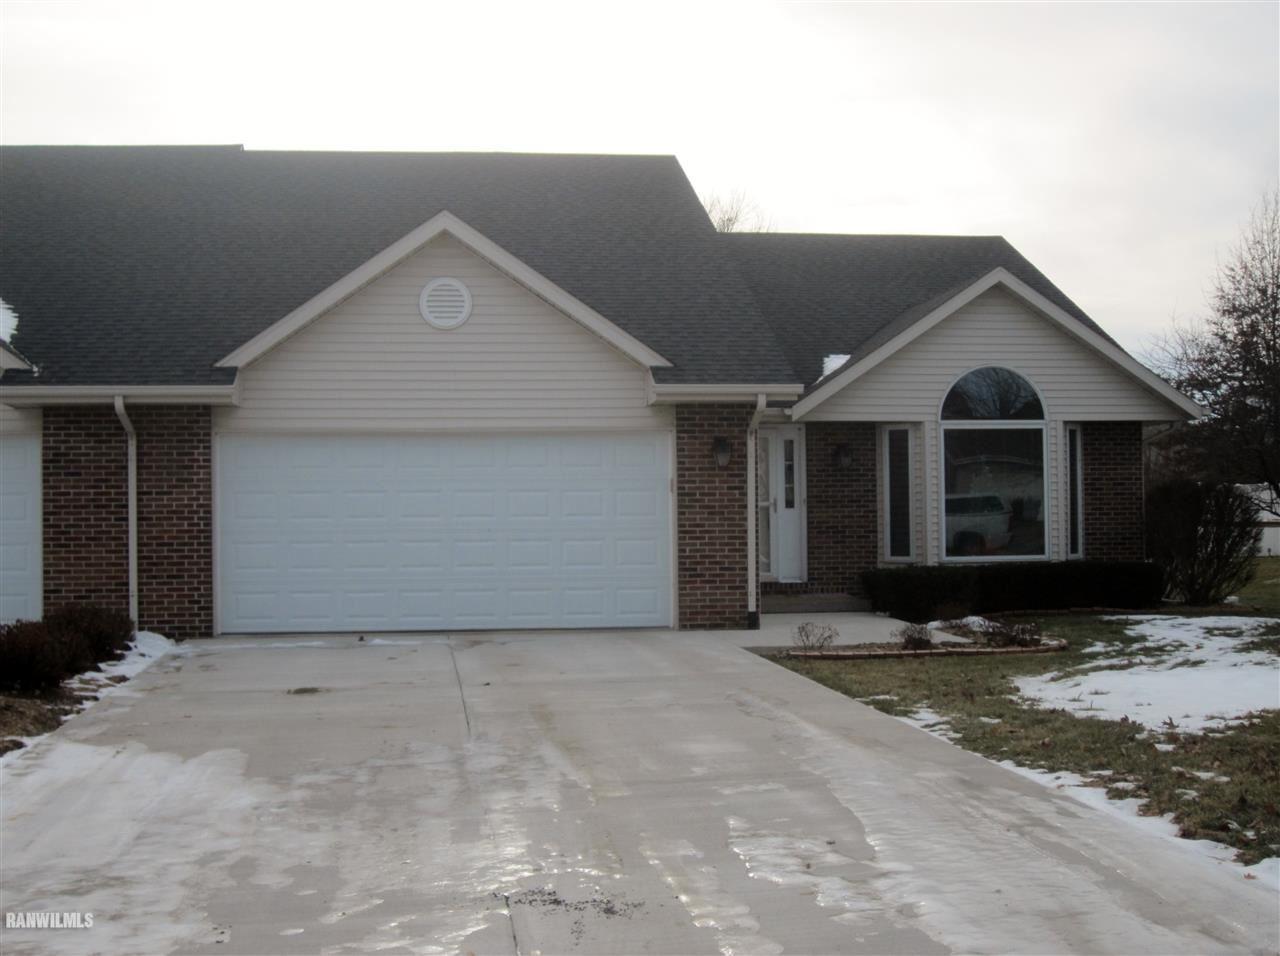 Real Estate for Sale, ListingId: 30821606, Freeport,IL61032